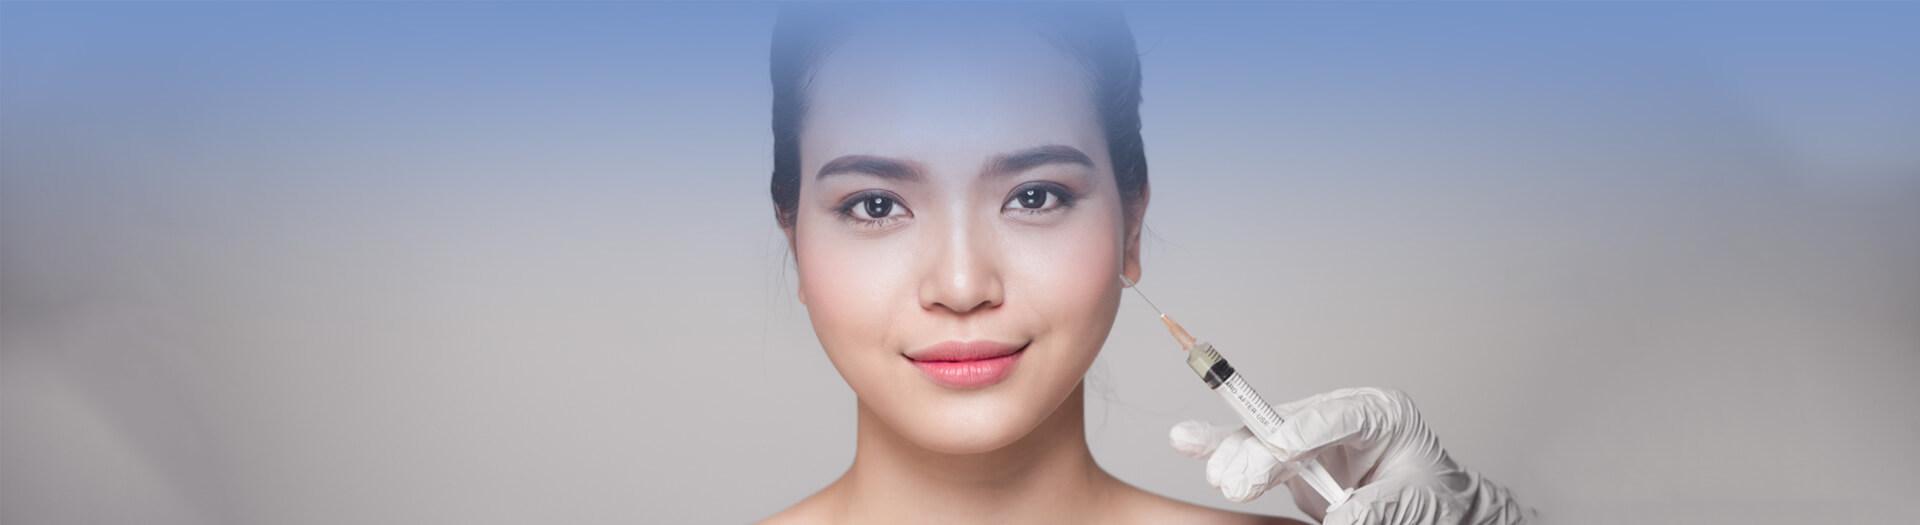 Woman receiving Restylane treatment